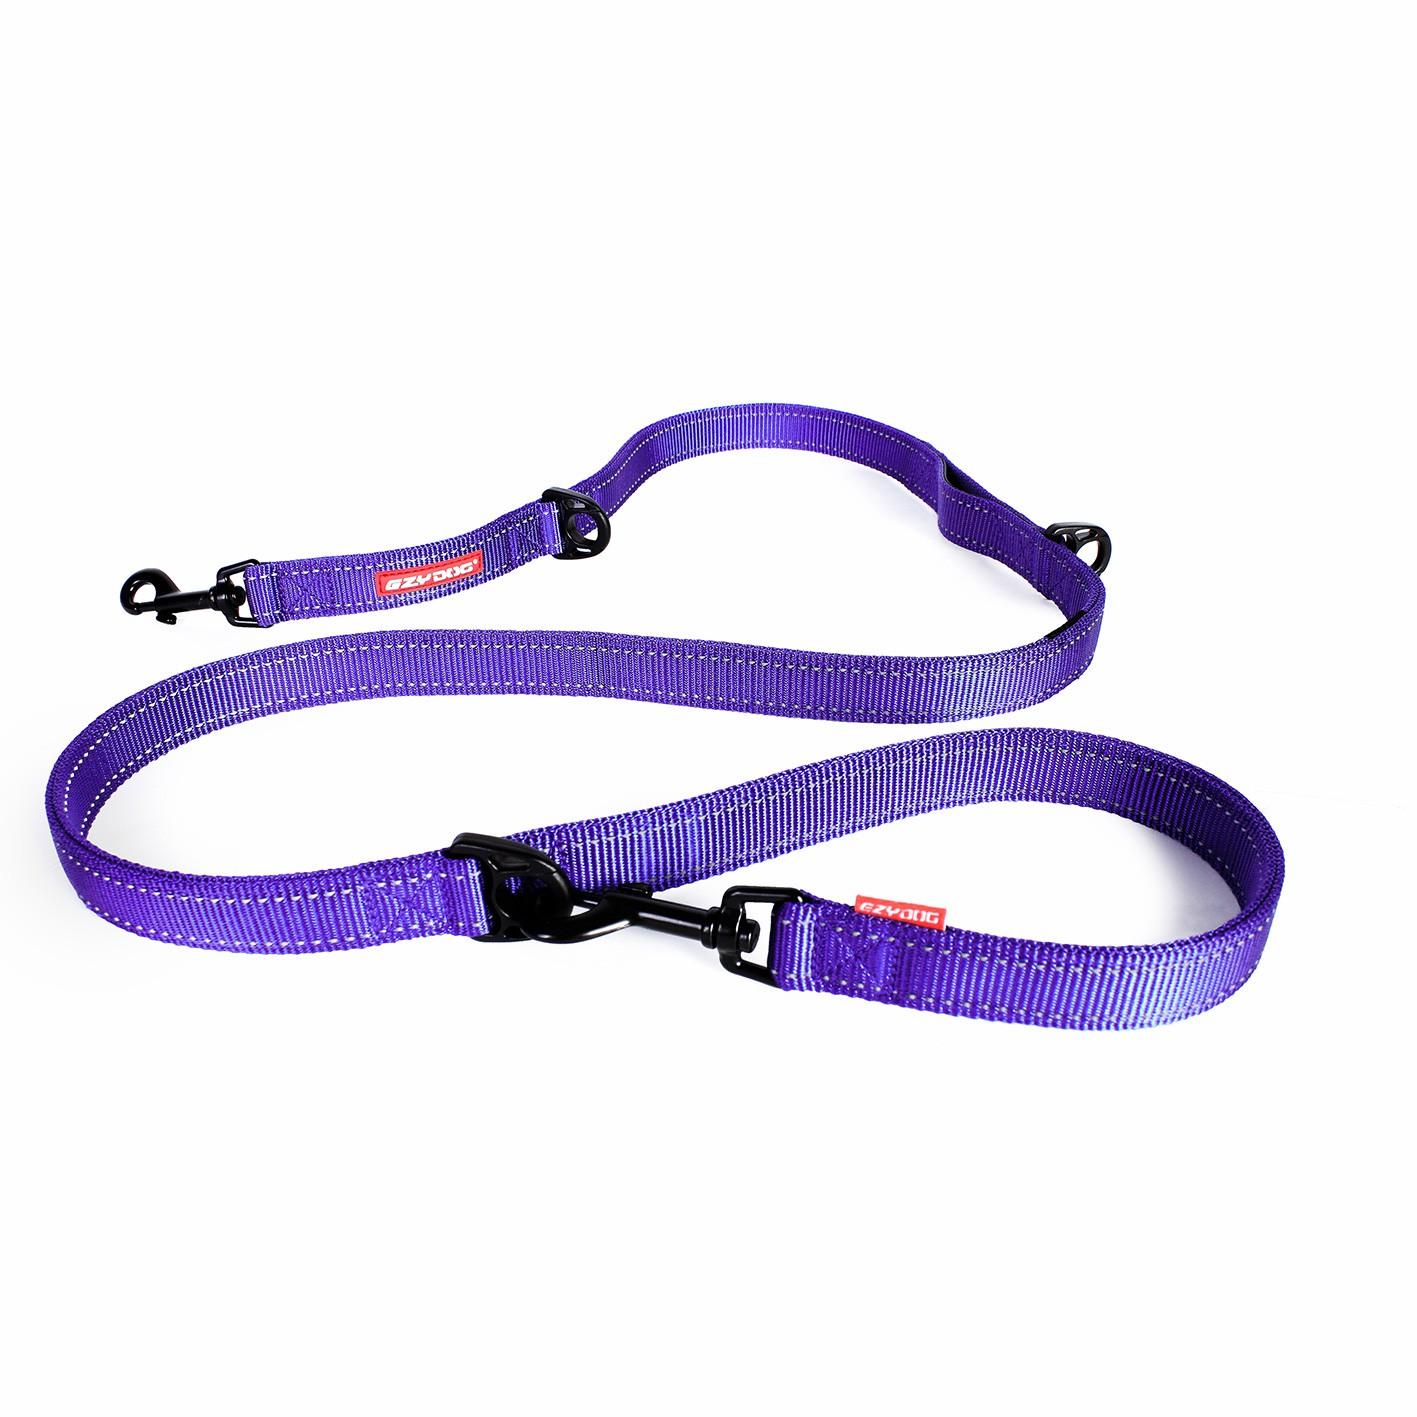 vario_6_purple_1.jpg